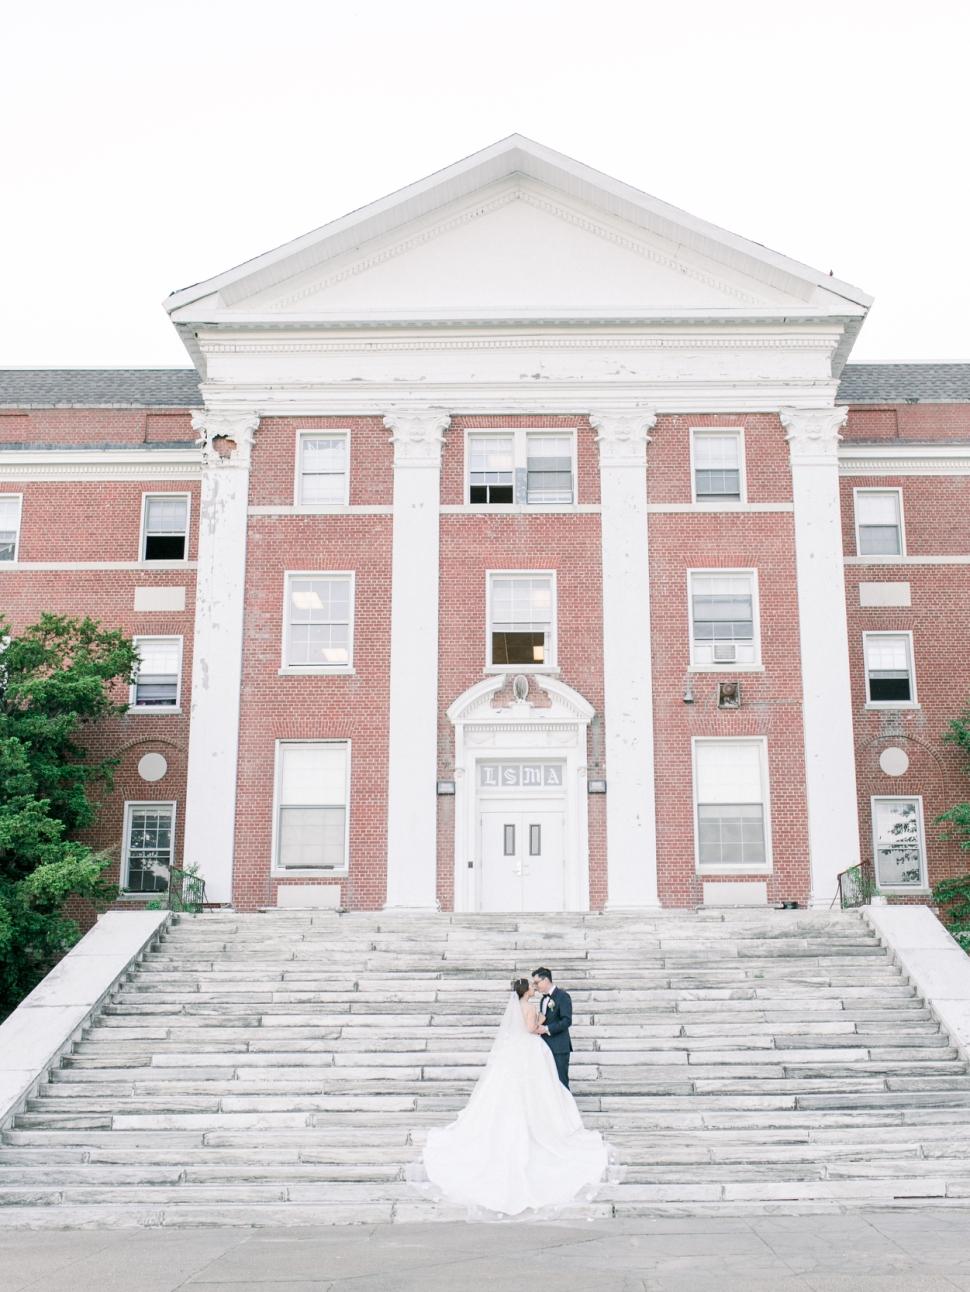 Bourne-Mansion-Wedding-Photos-Cassi-Claire-Long-Island-Wedding-Photographer_31.jpg